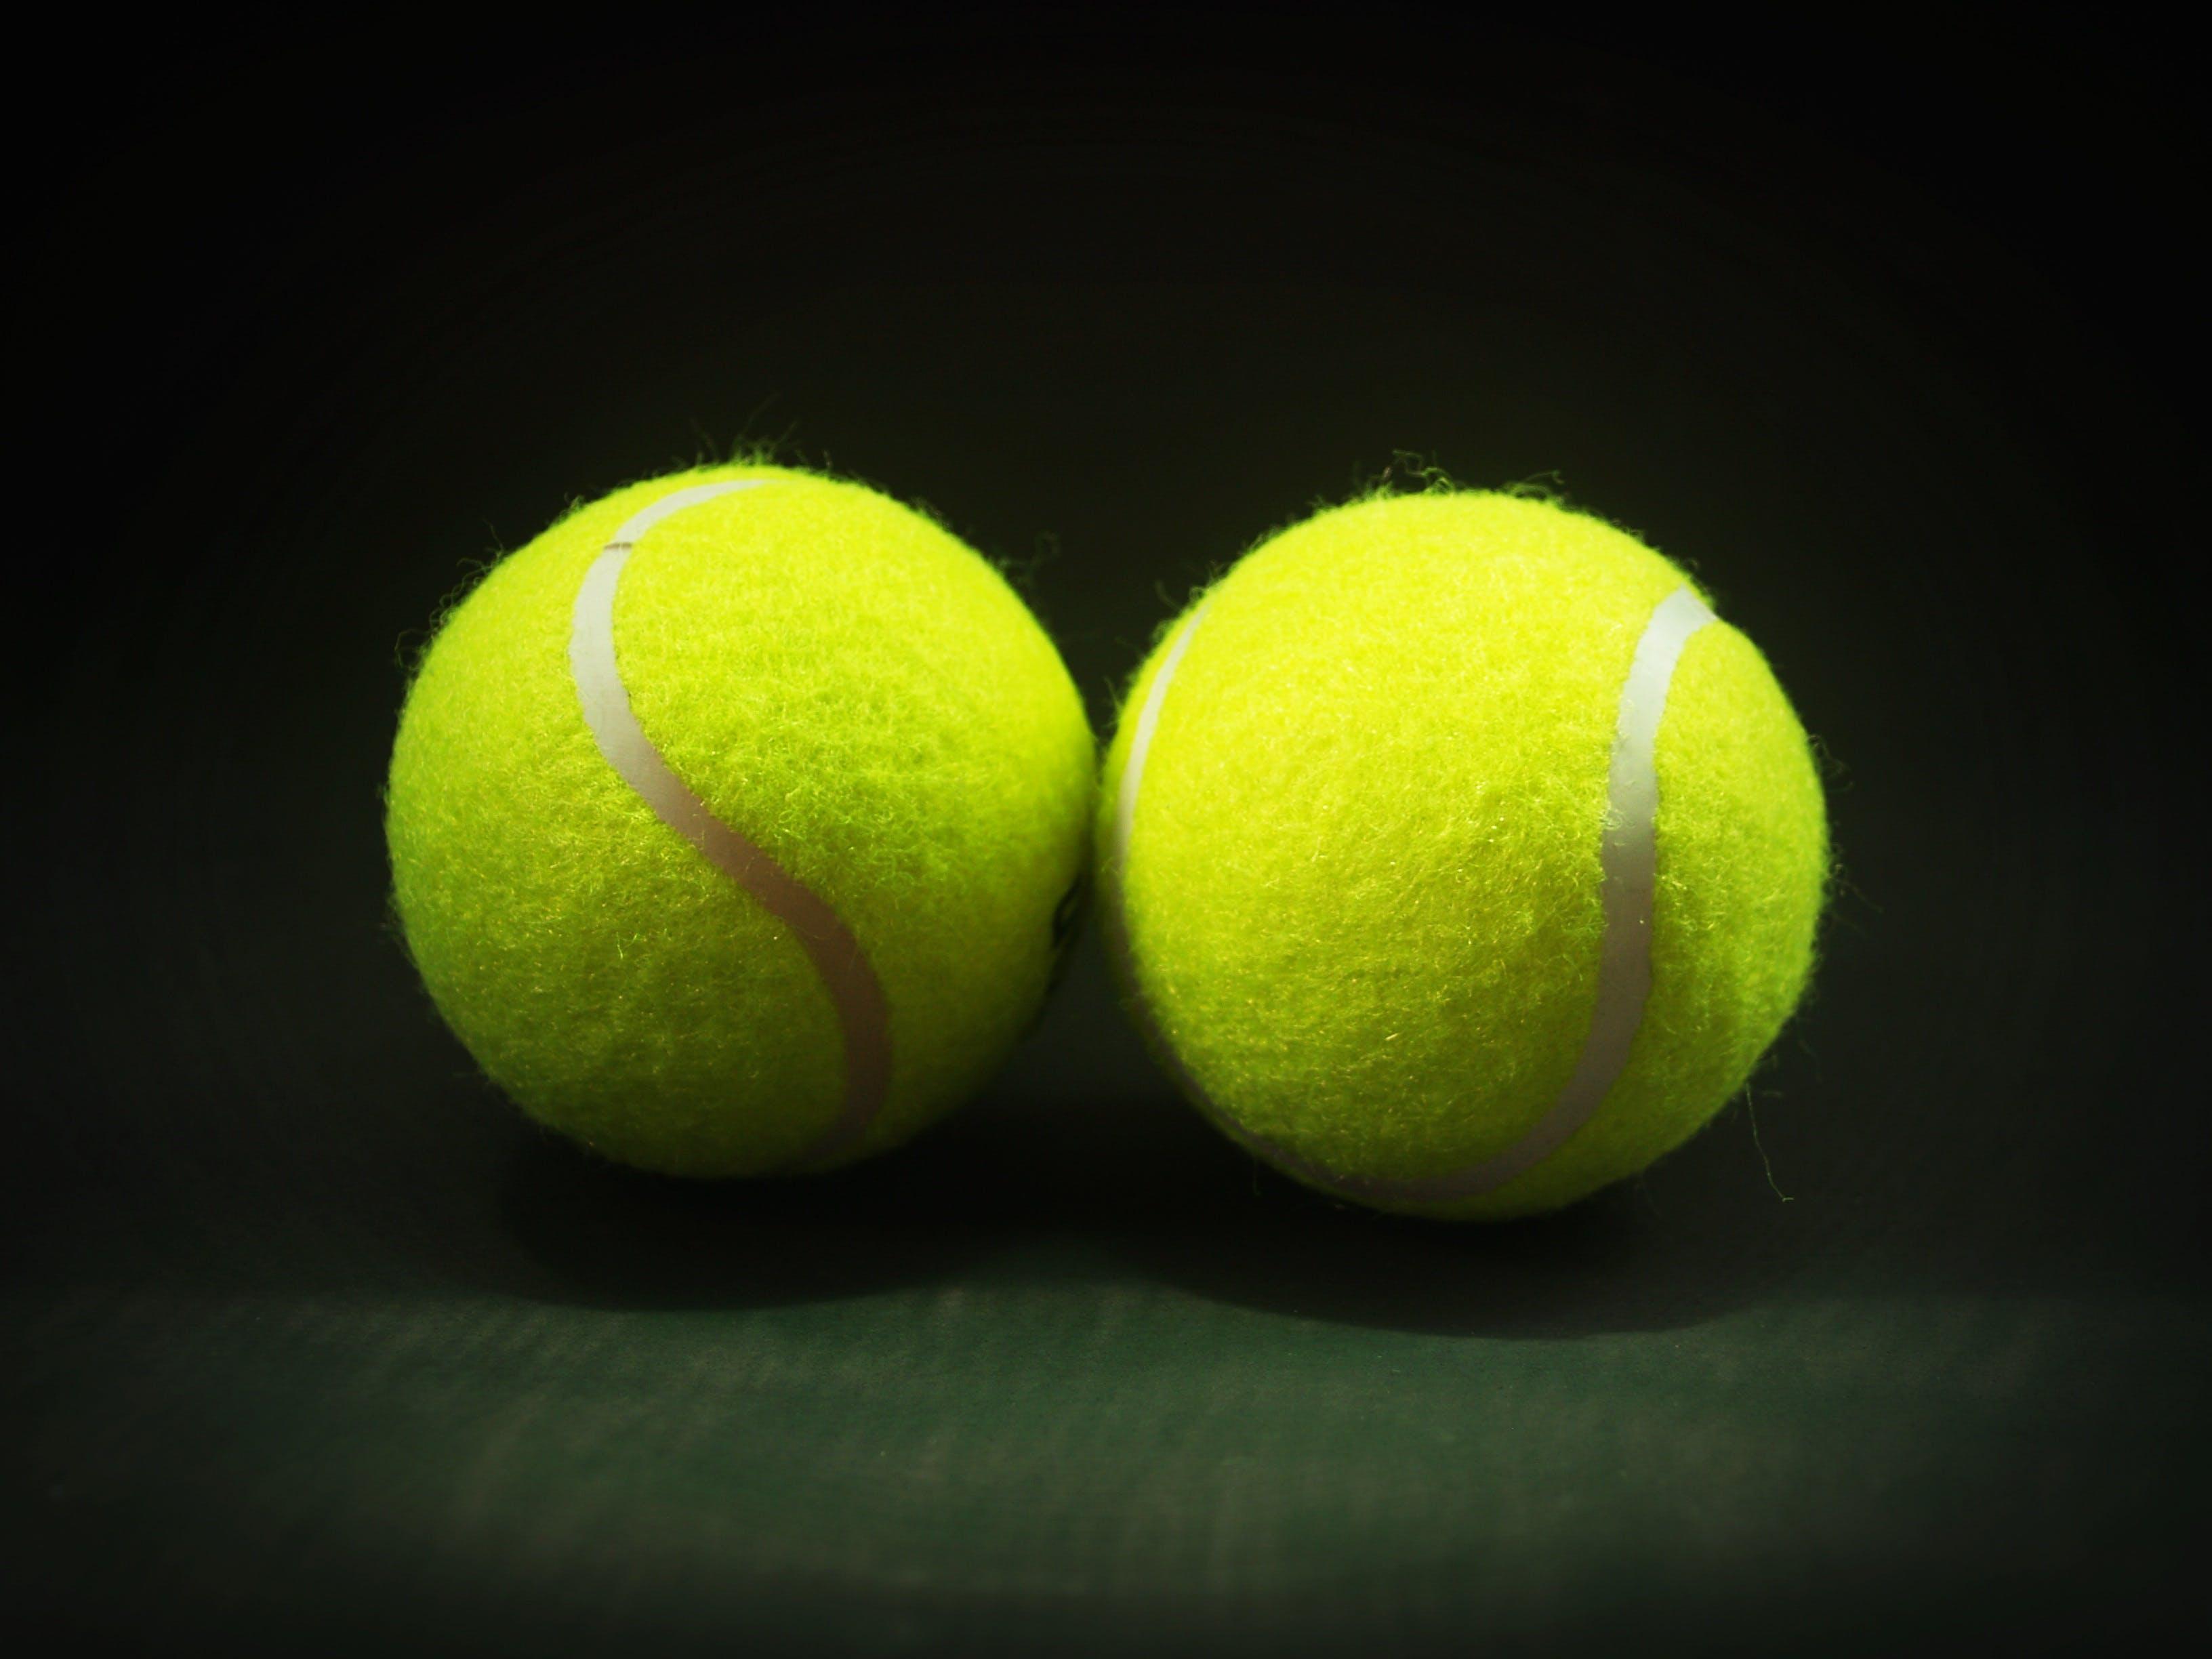 ball, balls, circle